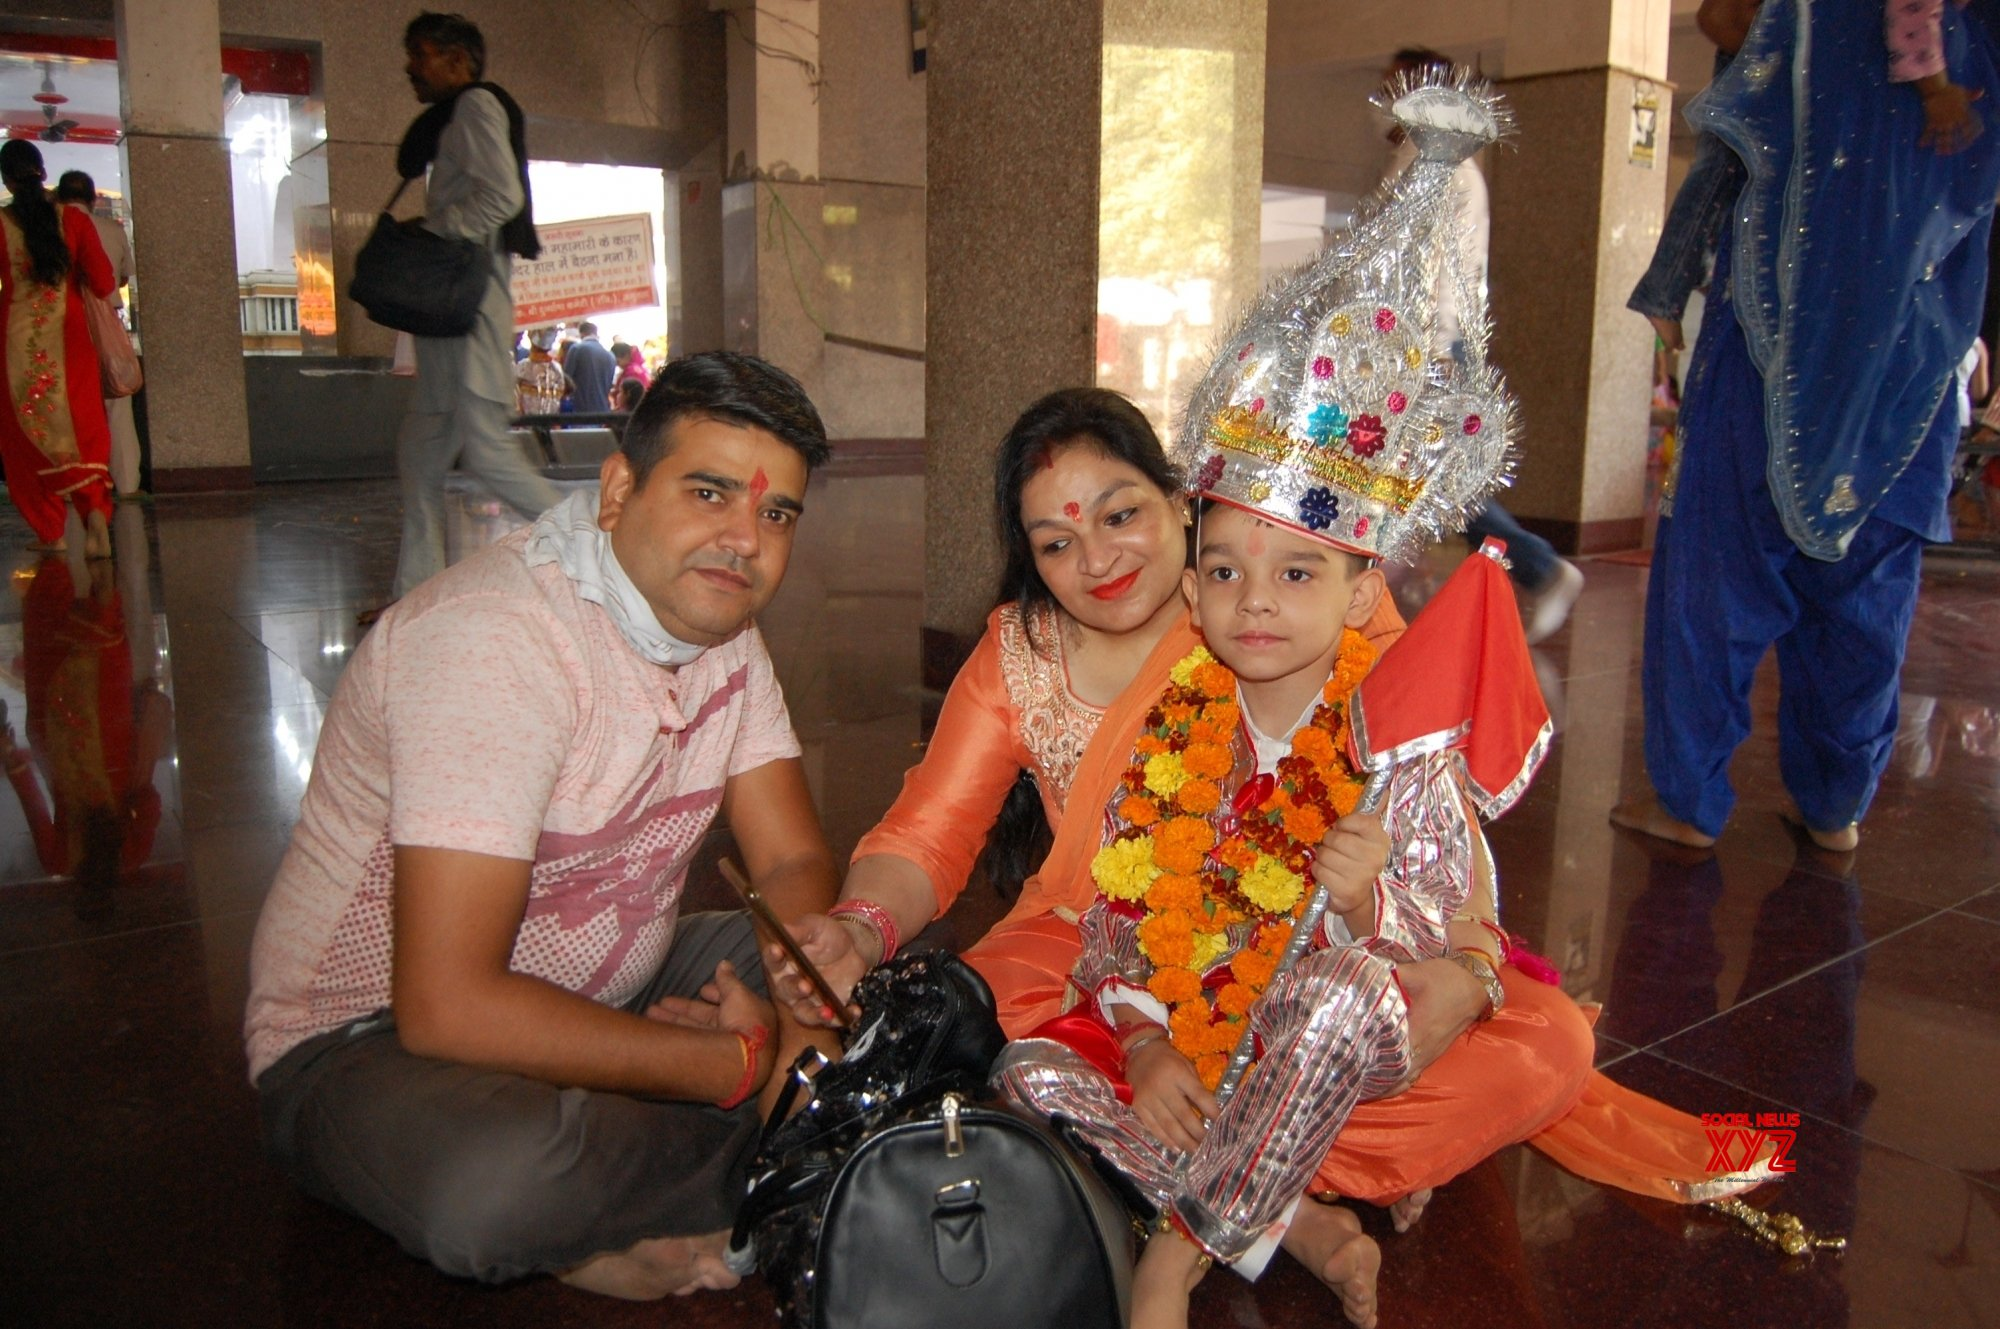 Amritsar: Devotees throng Bara Hanuman Temple on the first day of Navaratri #Gallery